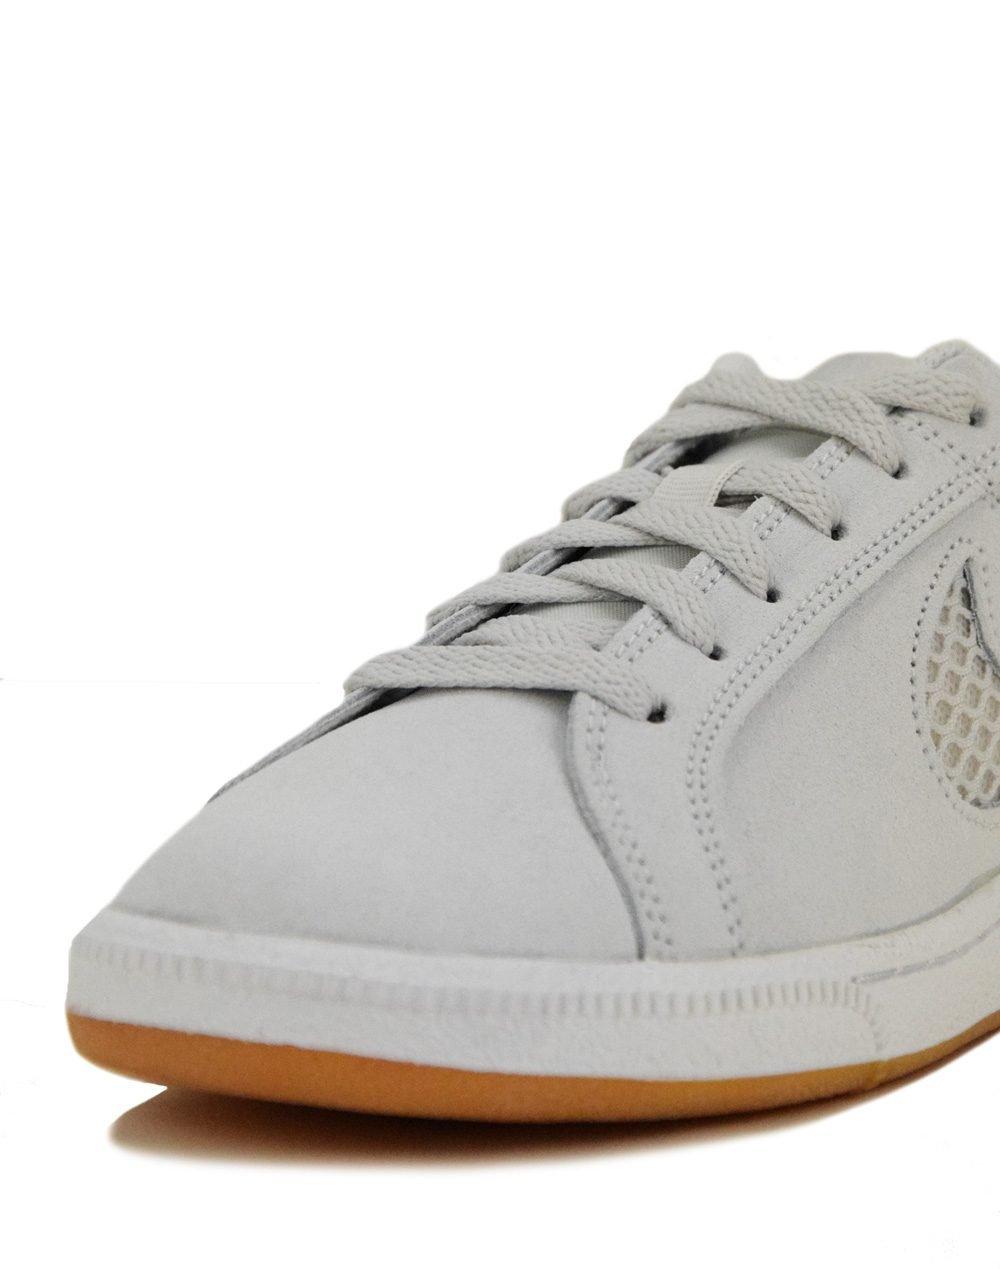 Nike Court Royal Premium (AJ7731 003) Platinum Tint